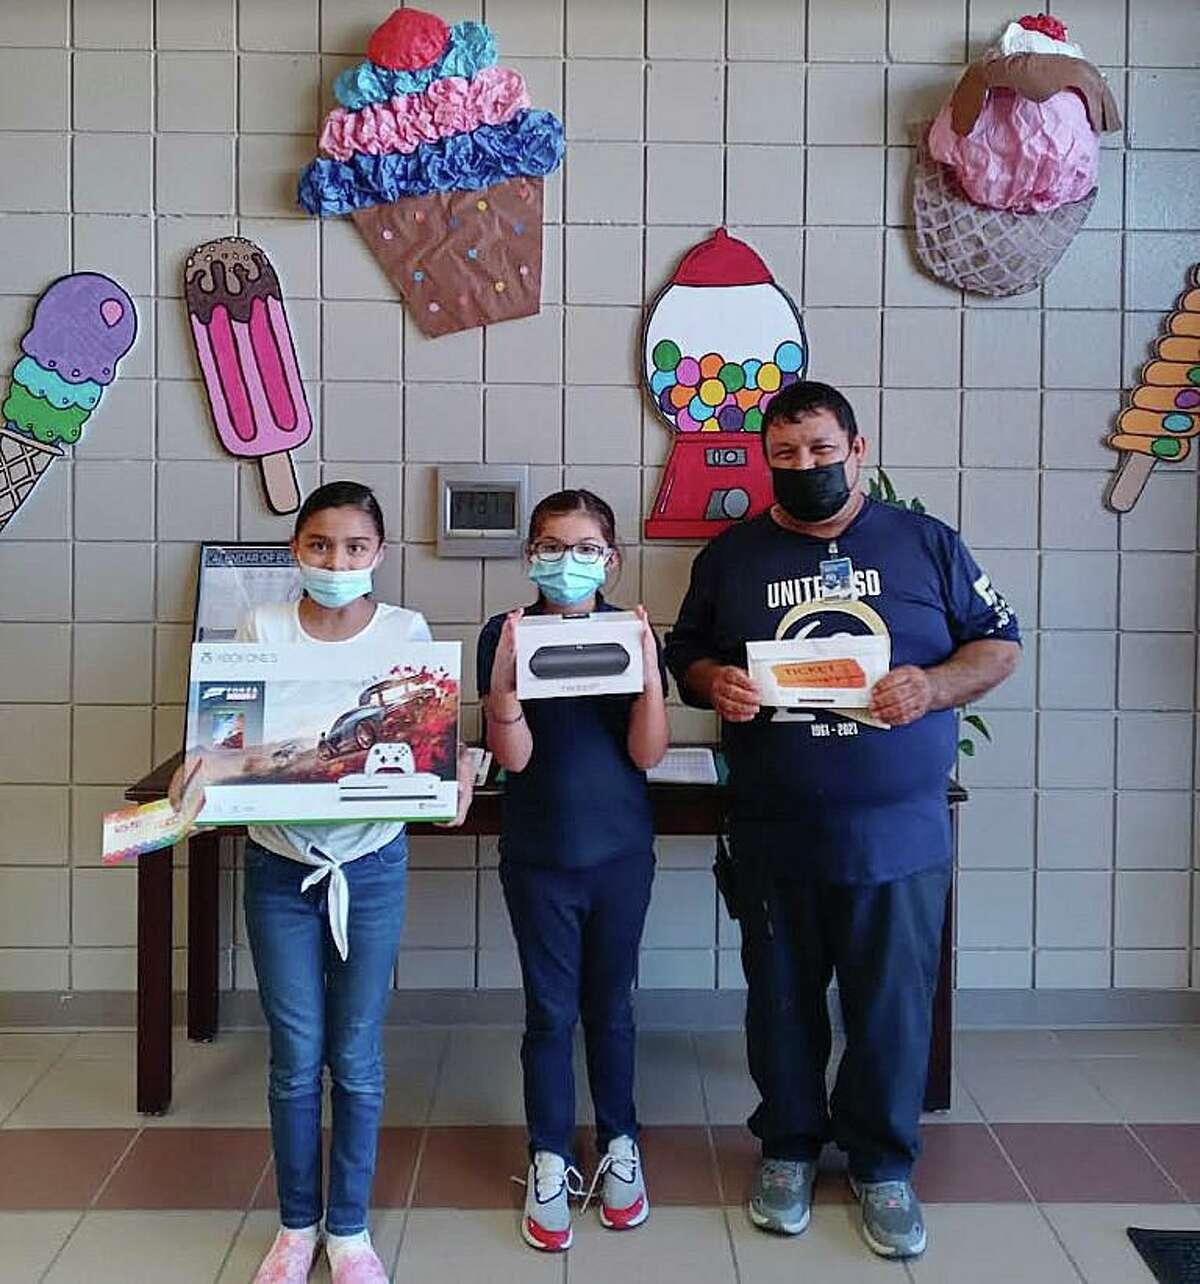 Pictured are Sophia Garza, Alexandria Rodriguez and Centeno Elementary School custodian Francisco Marquez.